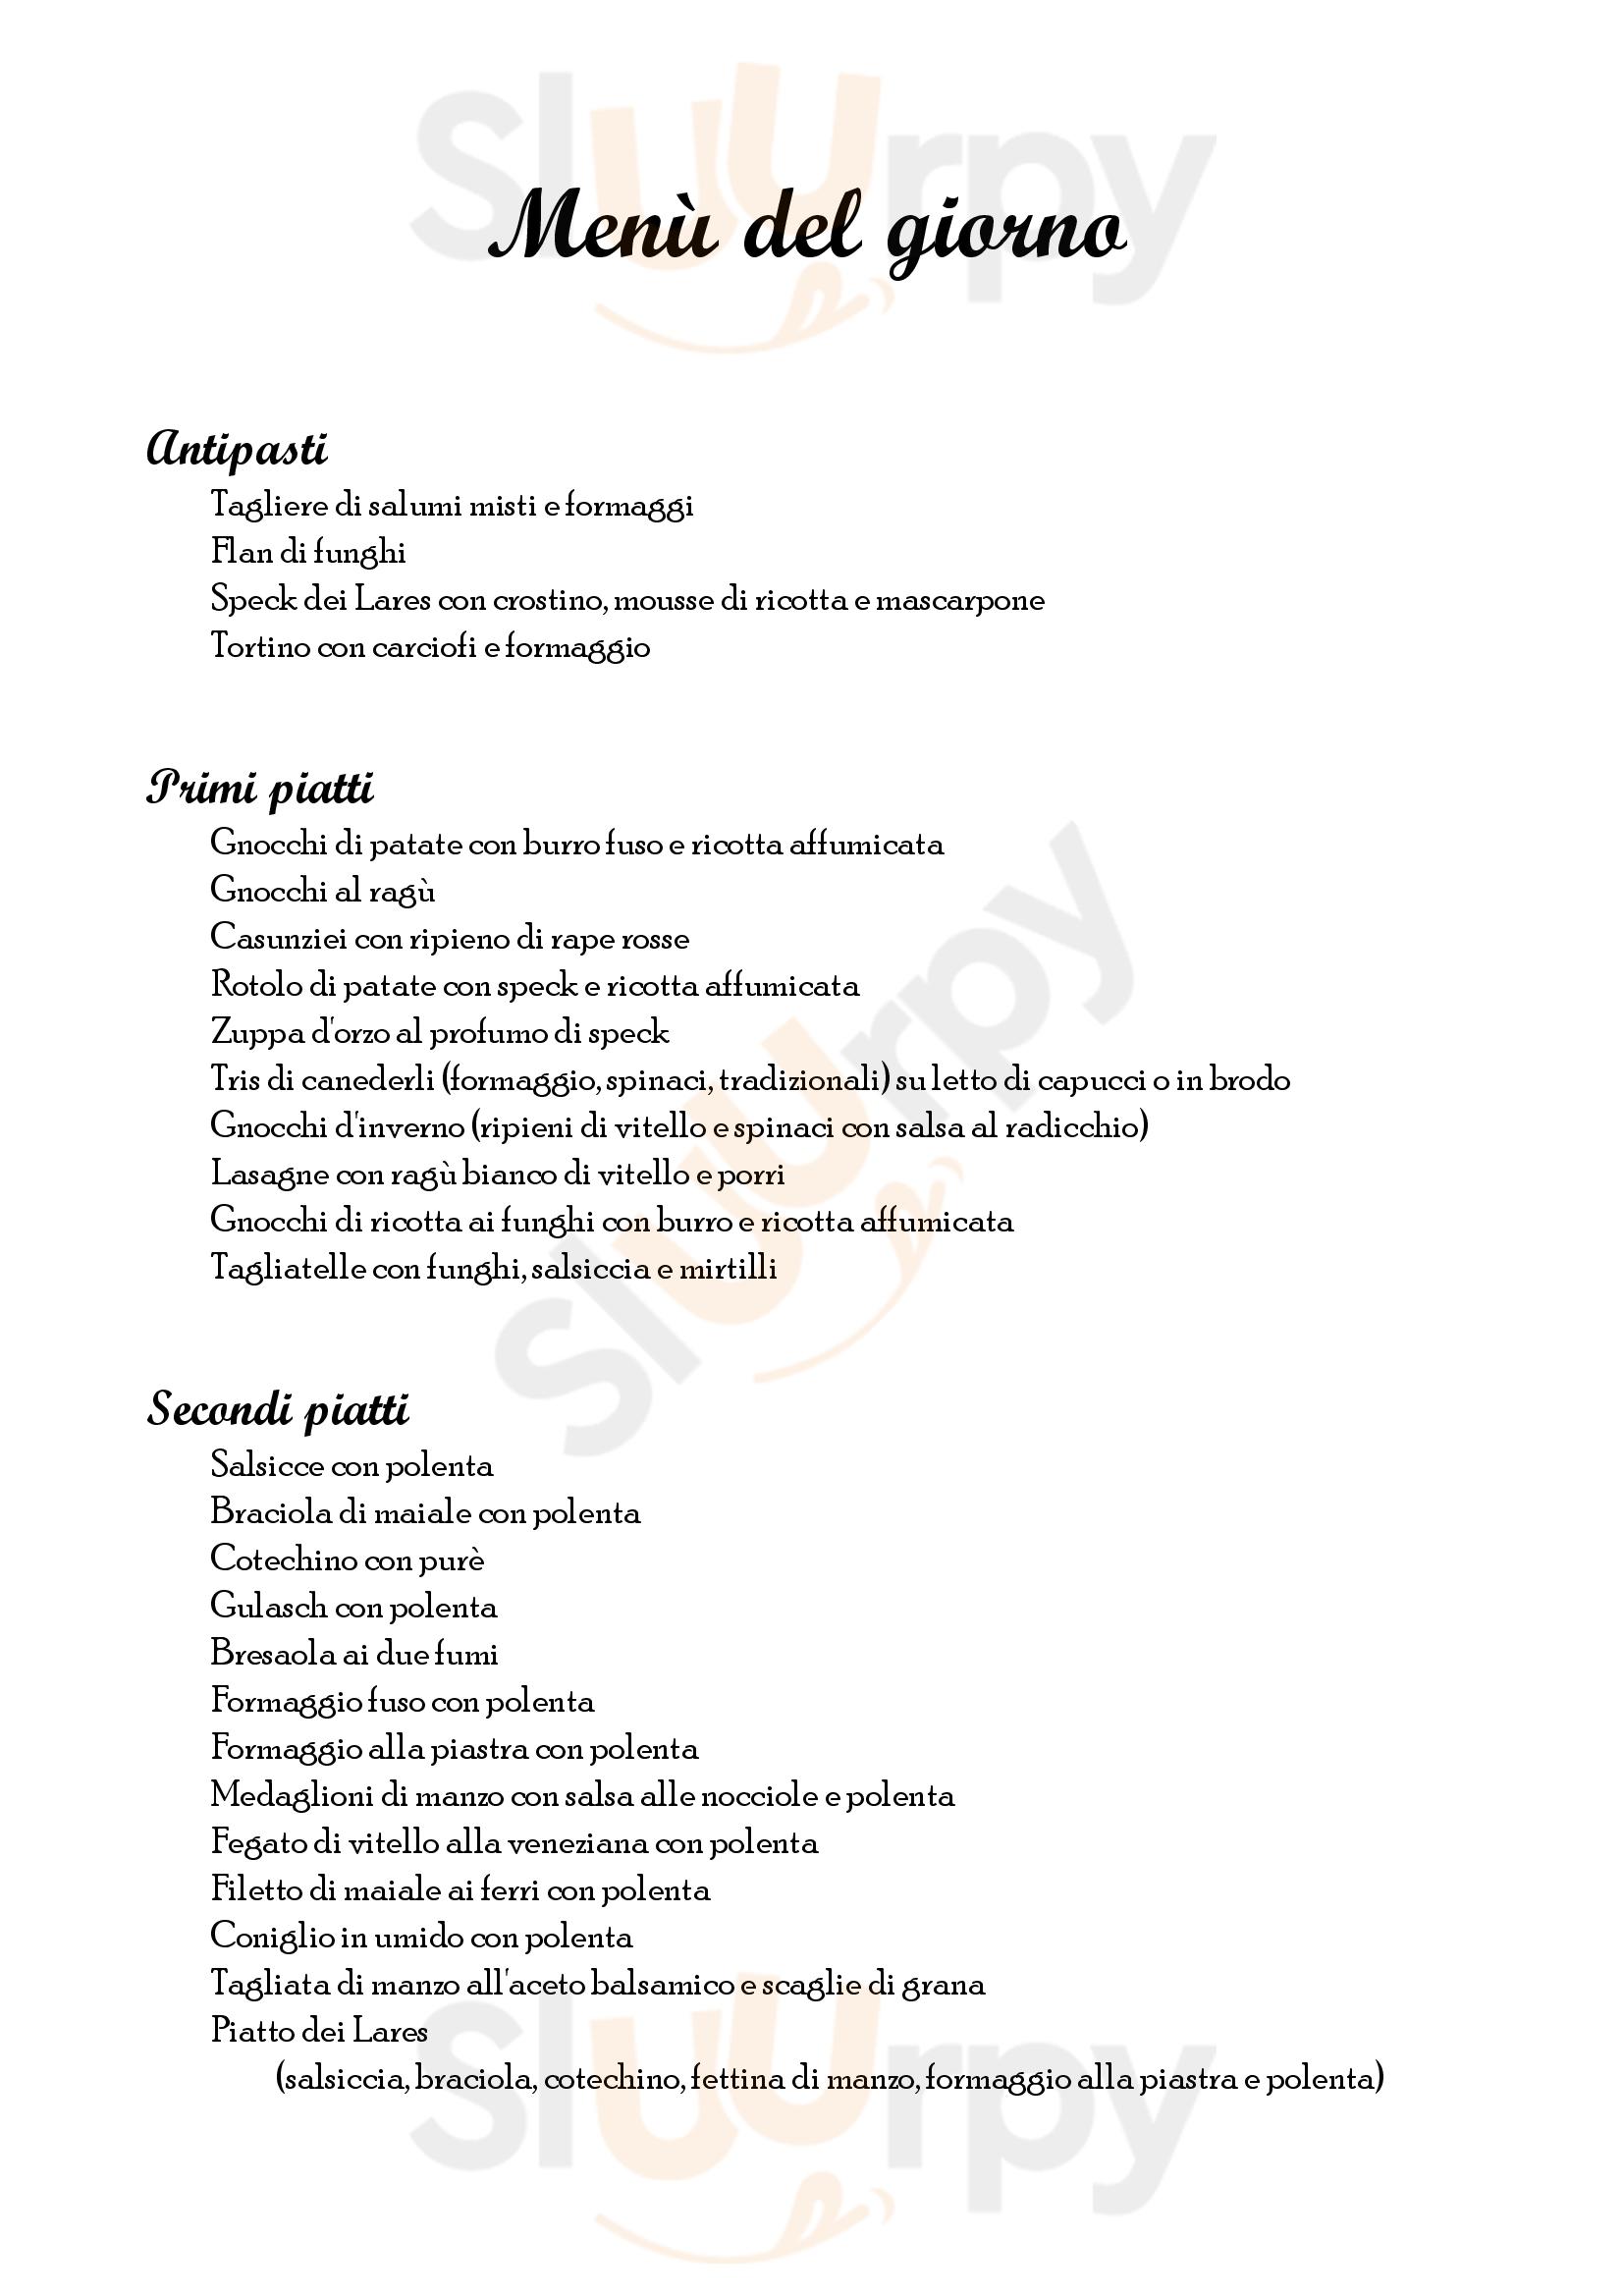 Ai Lares Auronzo di Cadore menù 1 pagina